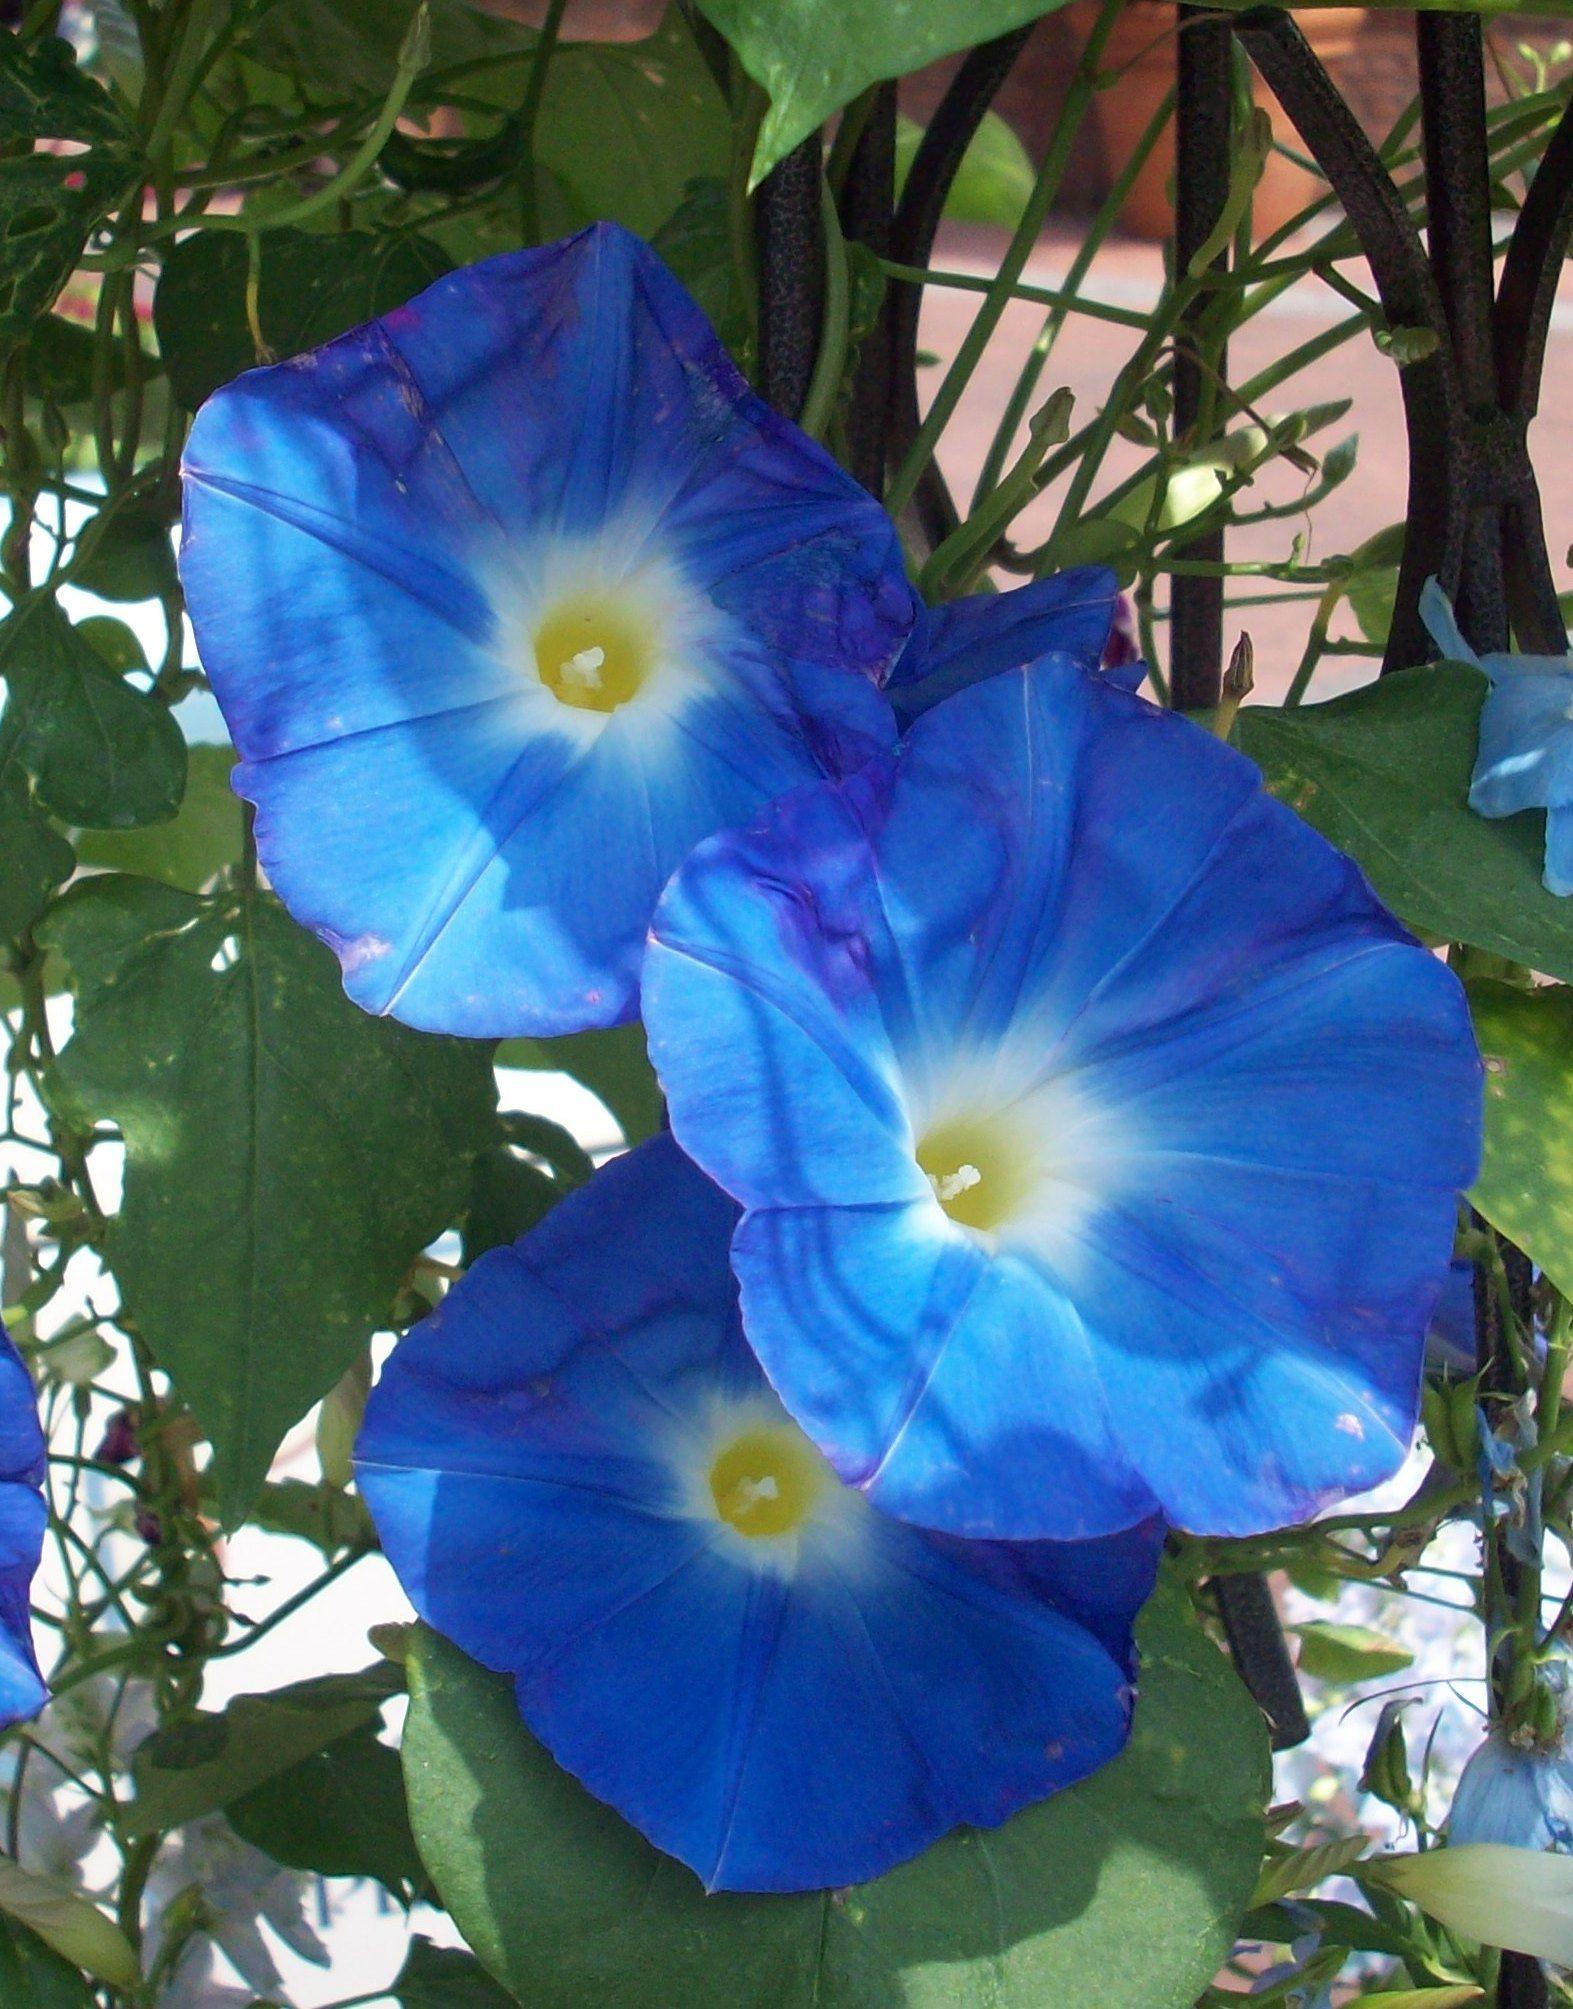 Morning Glory Clark S Heavenly Blue Flowers Nature Blue Flowers Morning Glory